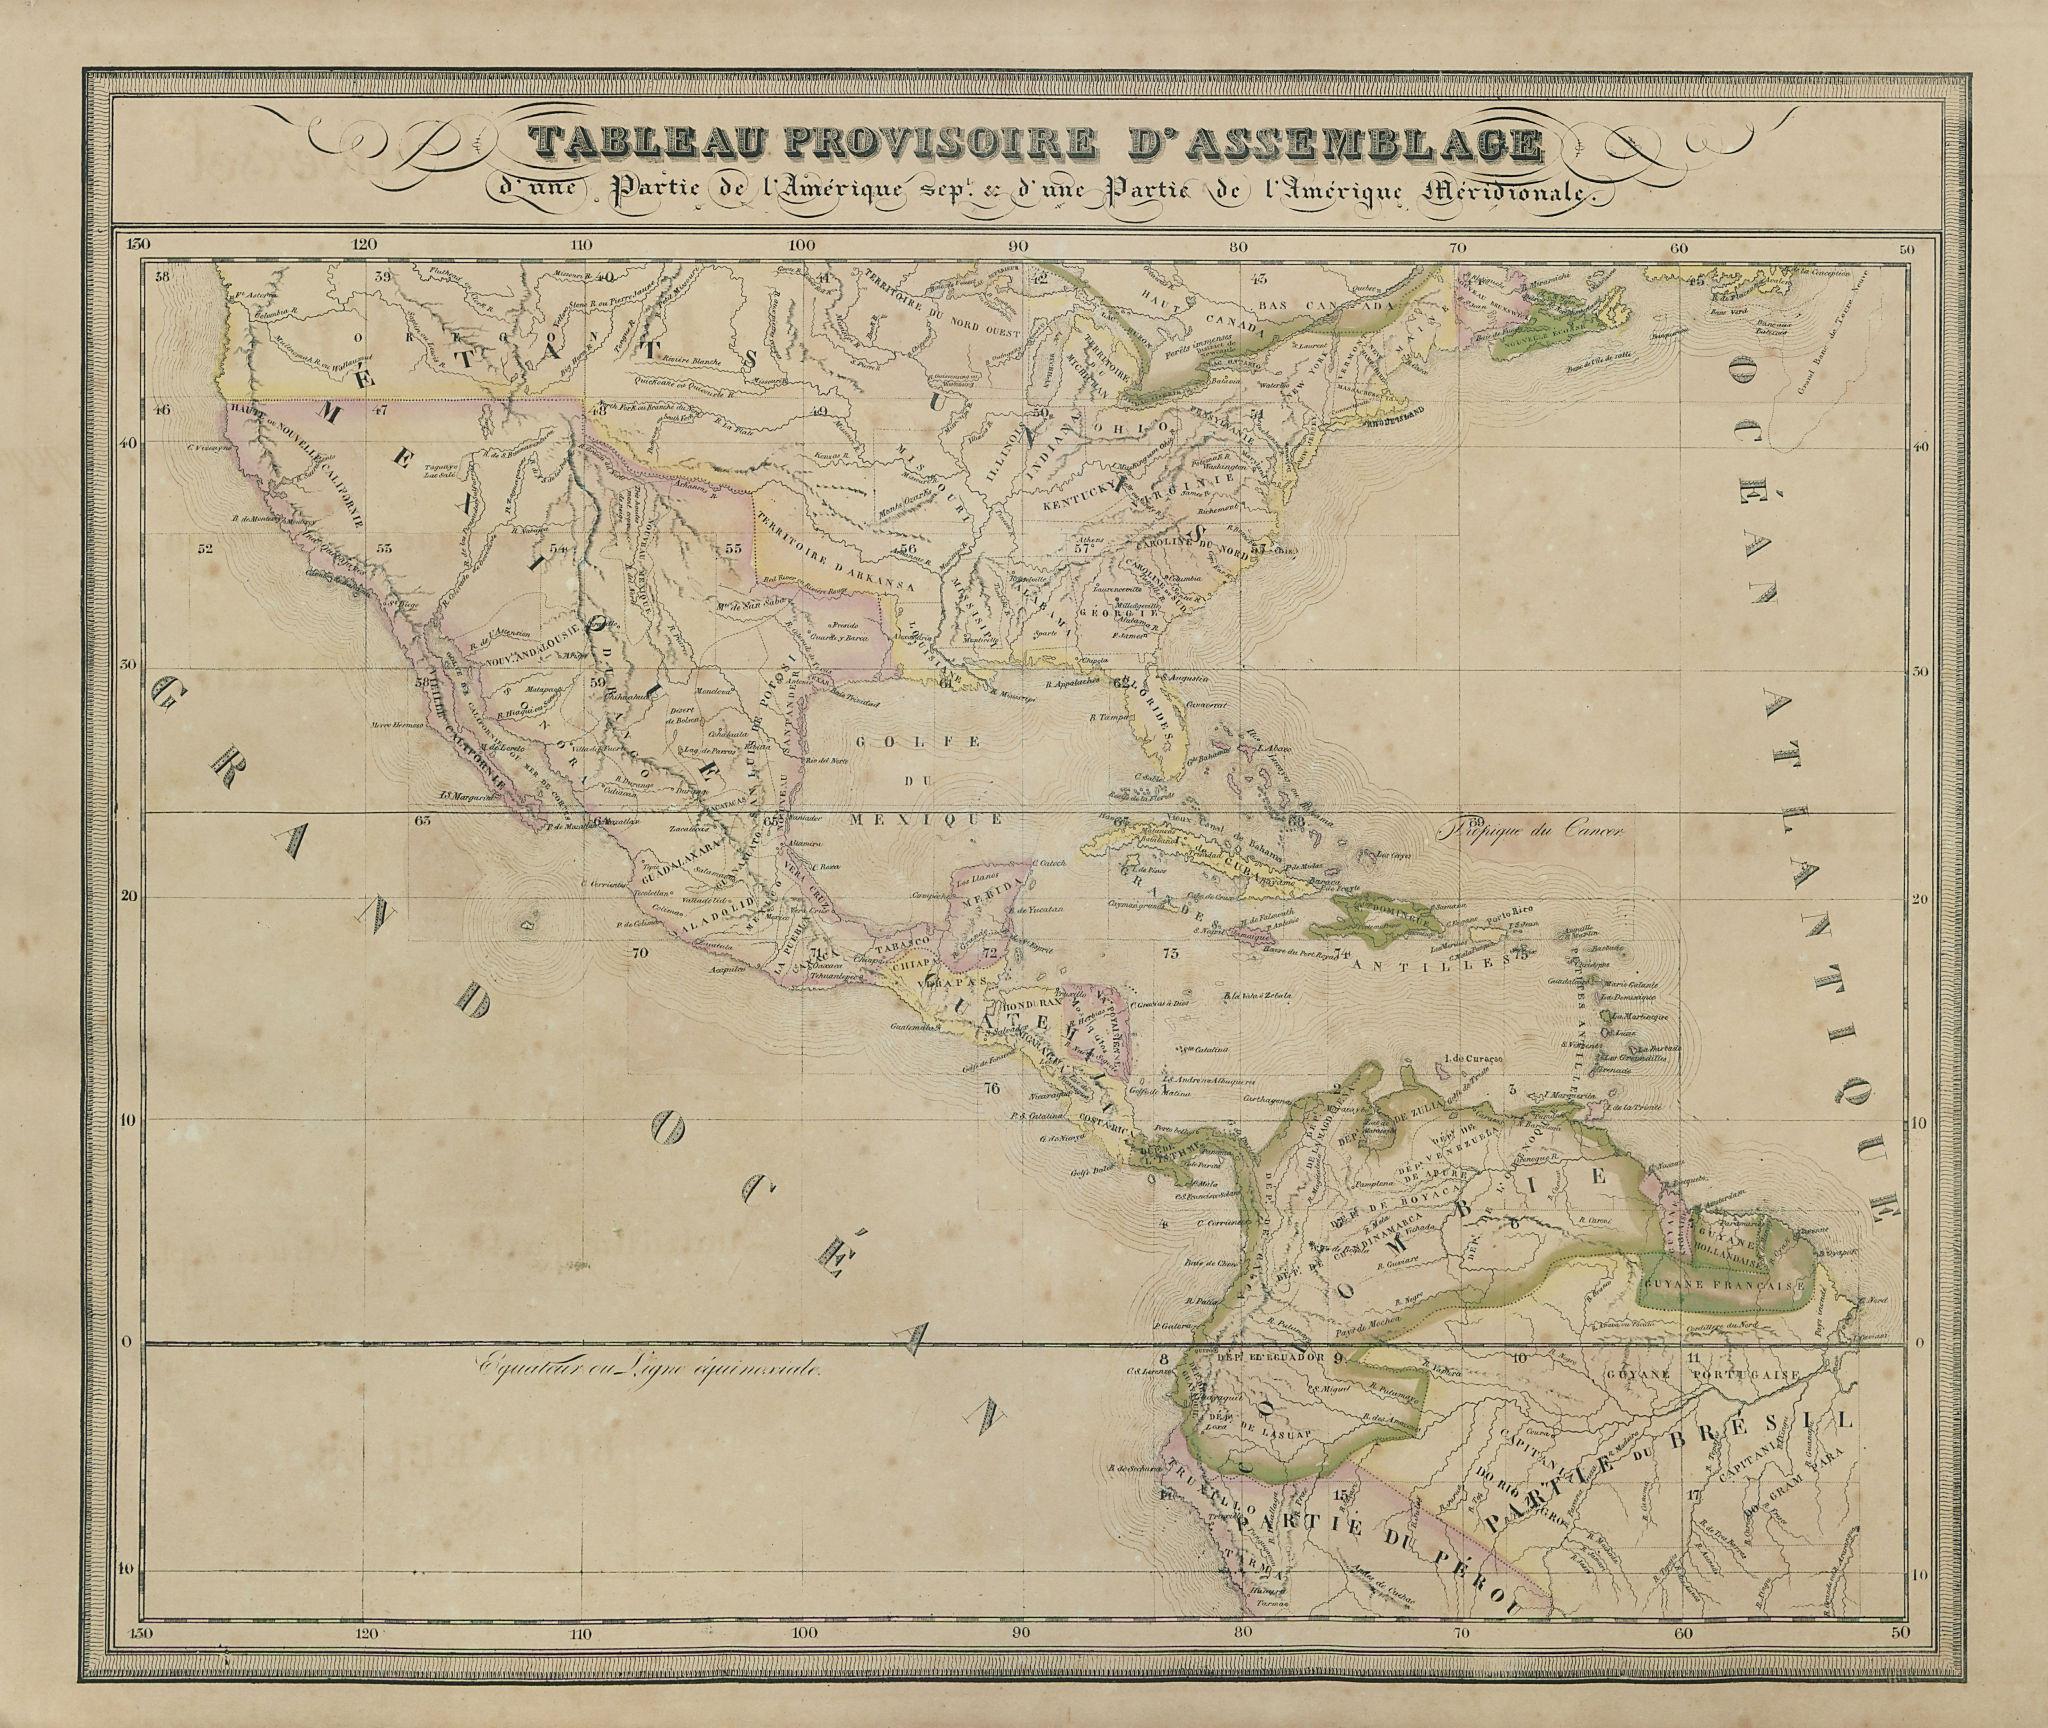 """Tableau Provisoire d'Assemblage…"" North & Central America VANDERMAELEN 1827 map"